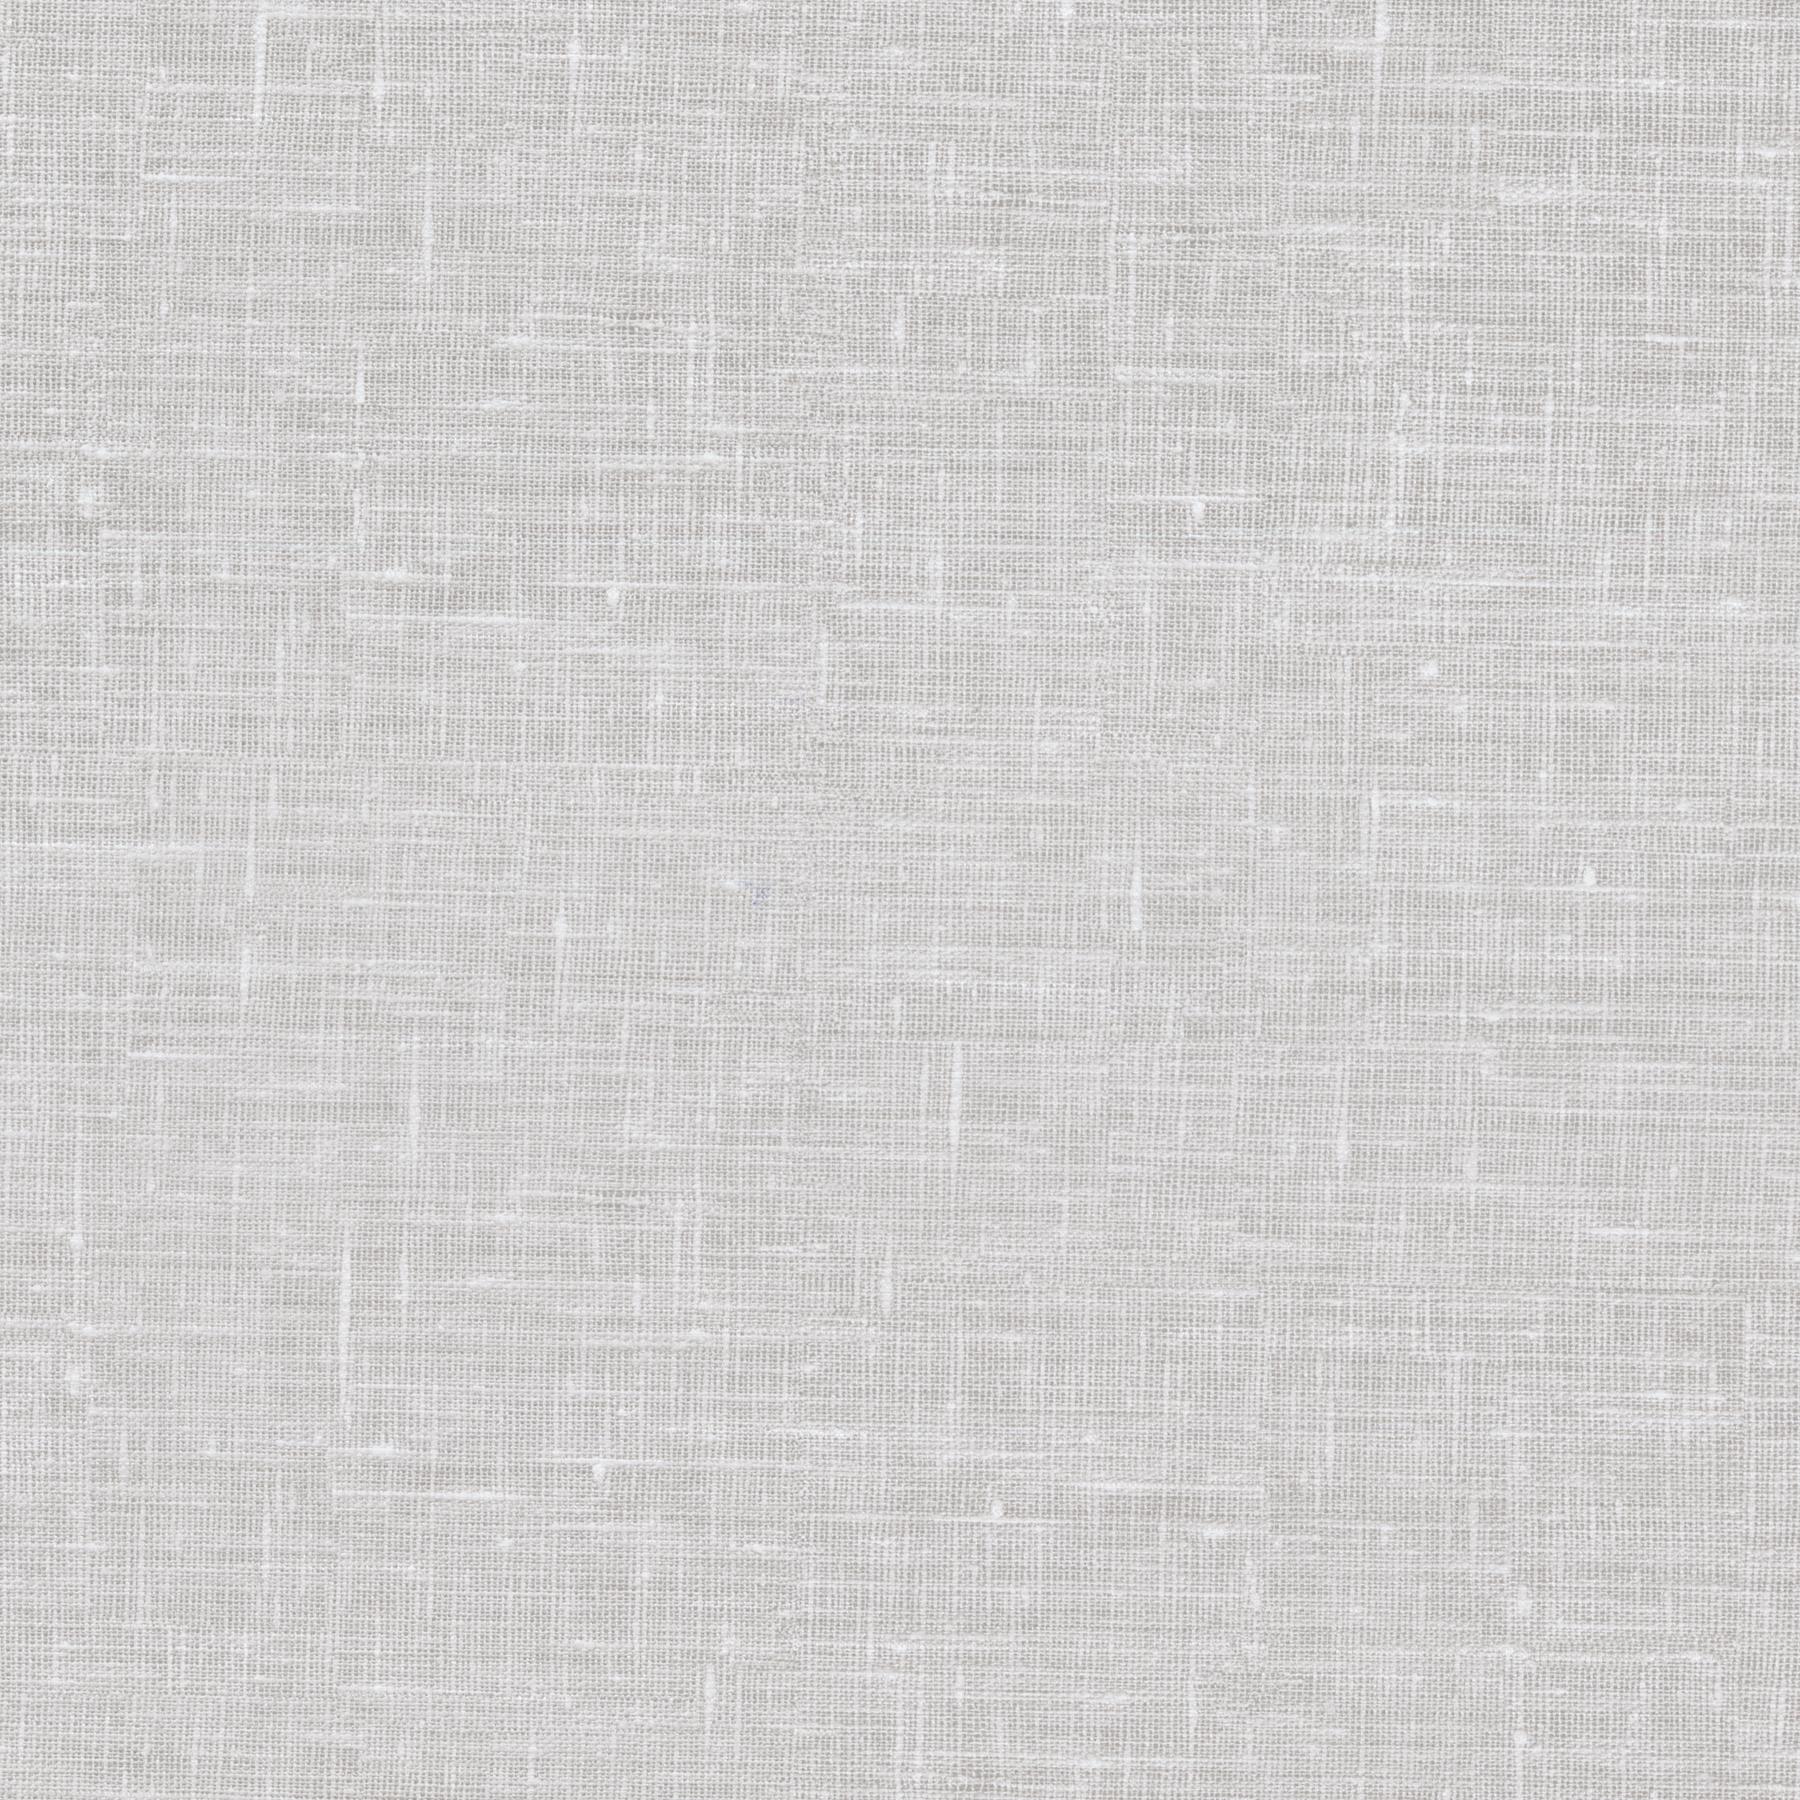 Brewster Wallpaper Linge White Linen Texture - InteriorDecorating.com